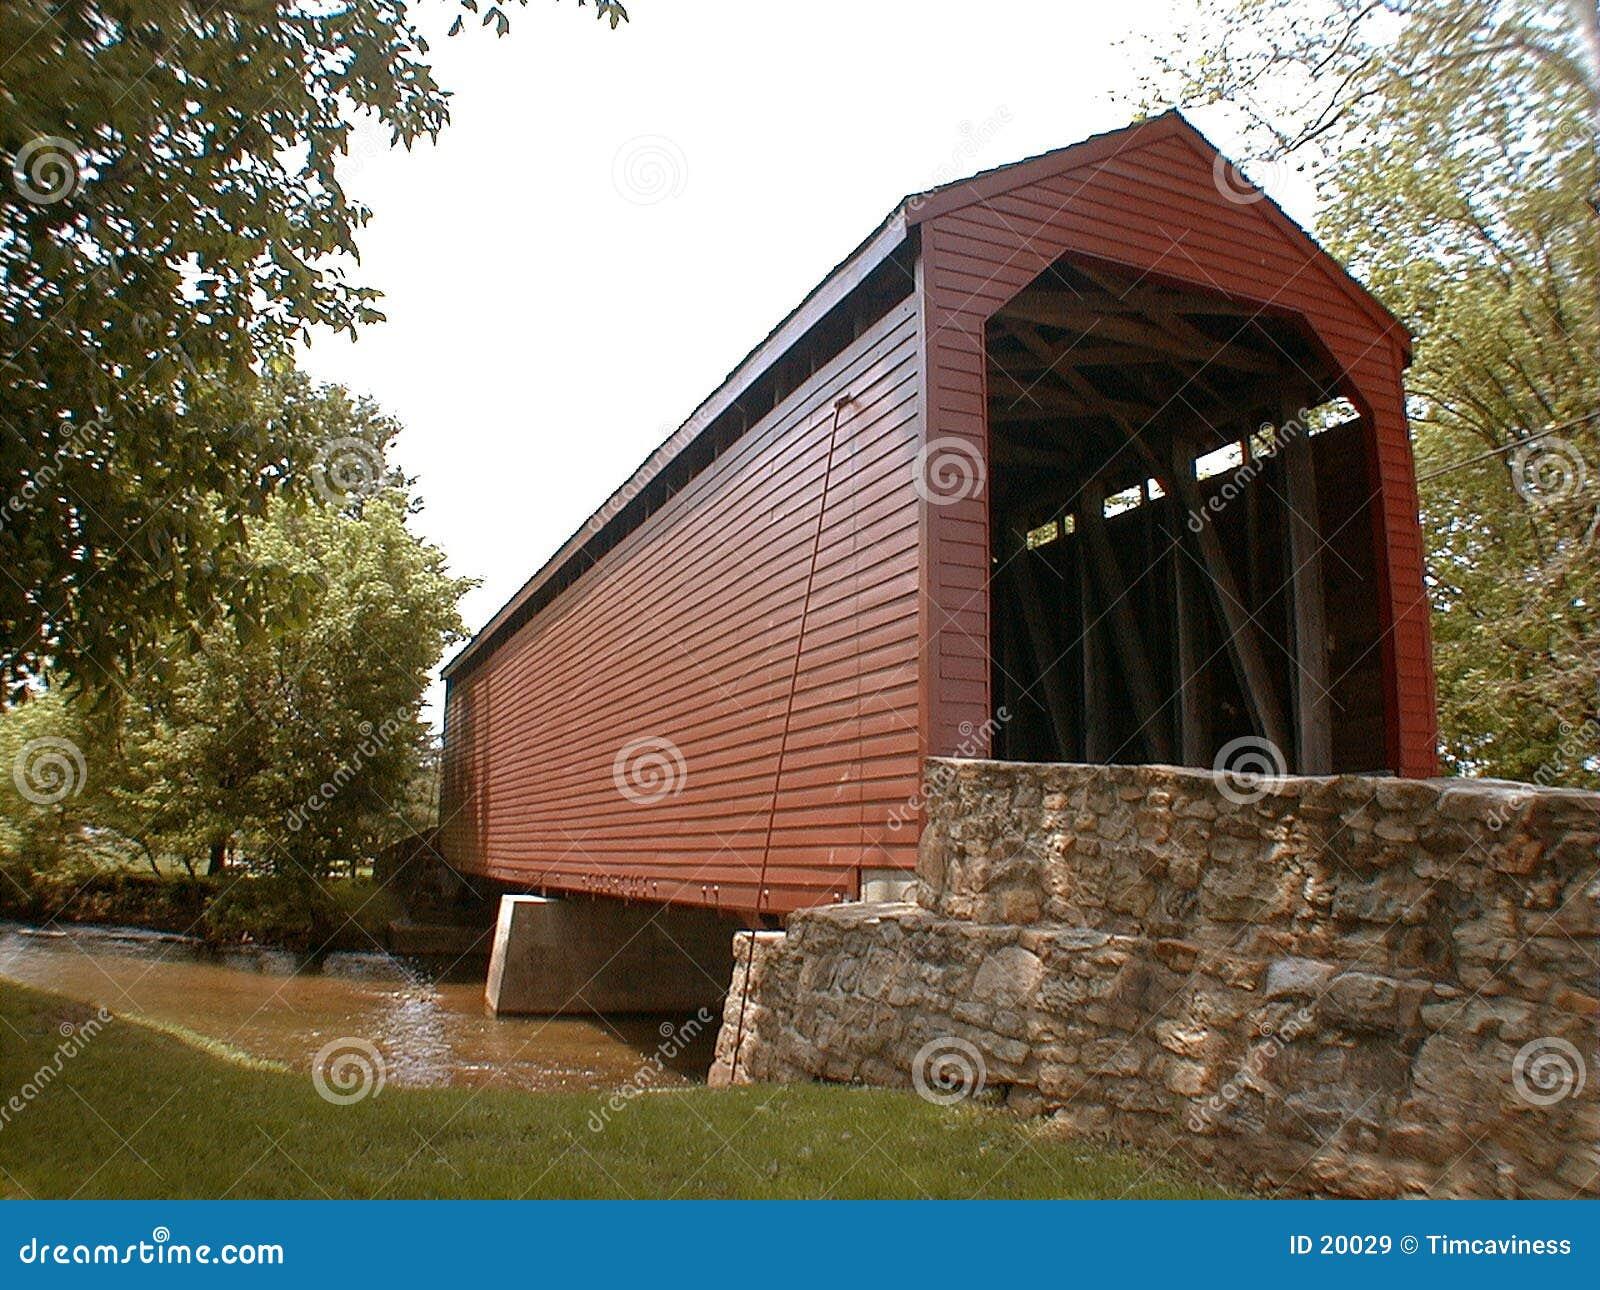 An Historic Covered Bridge